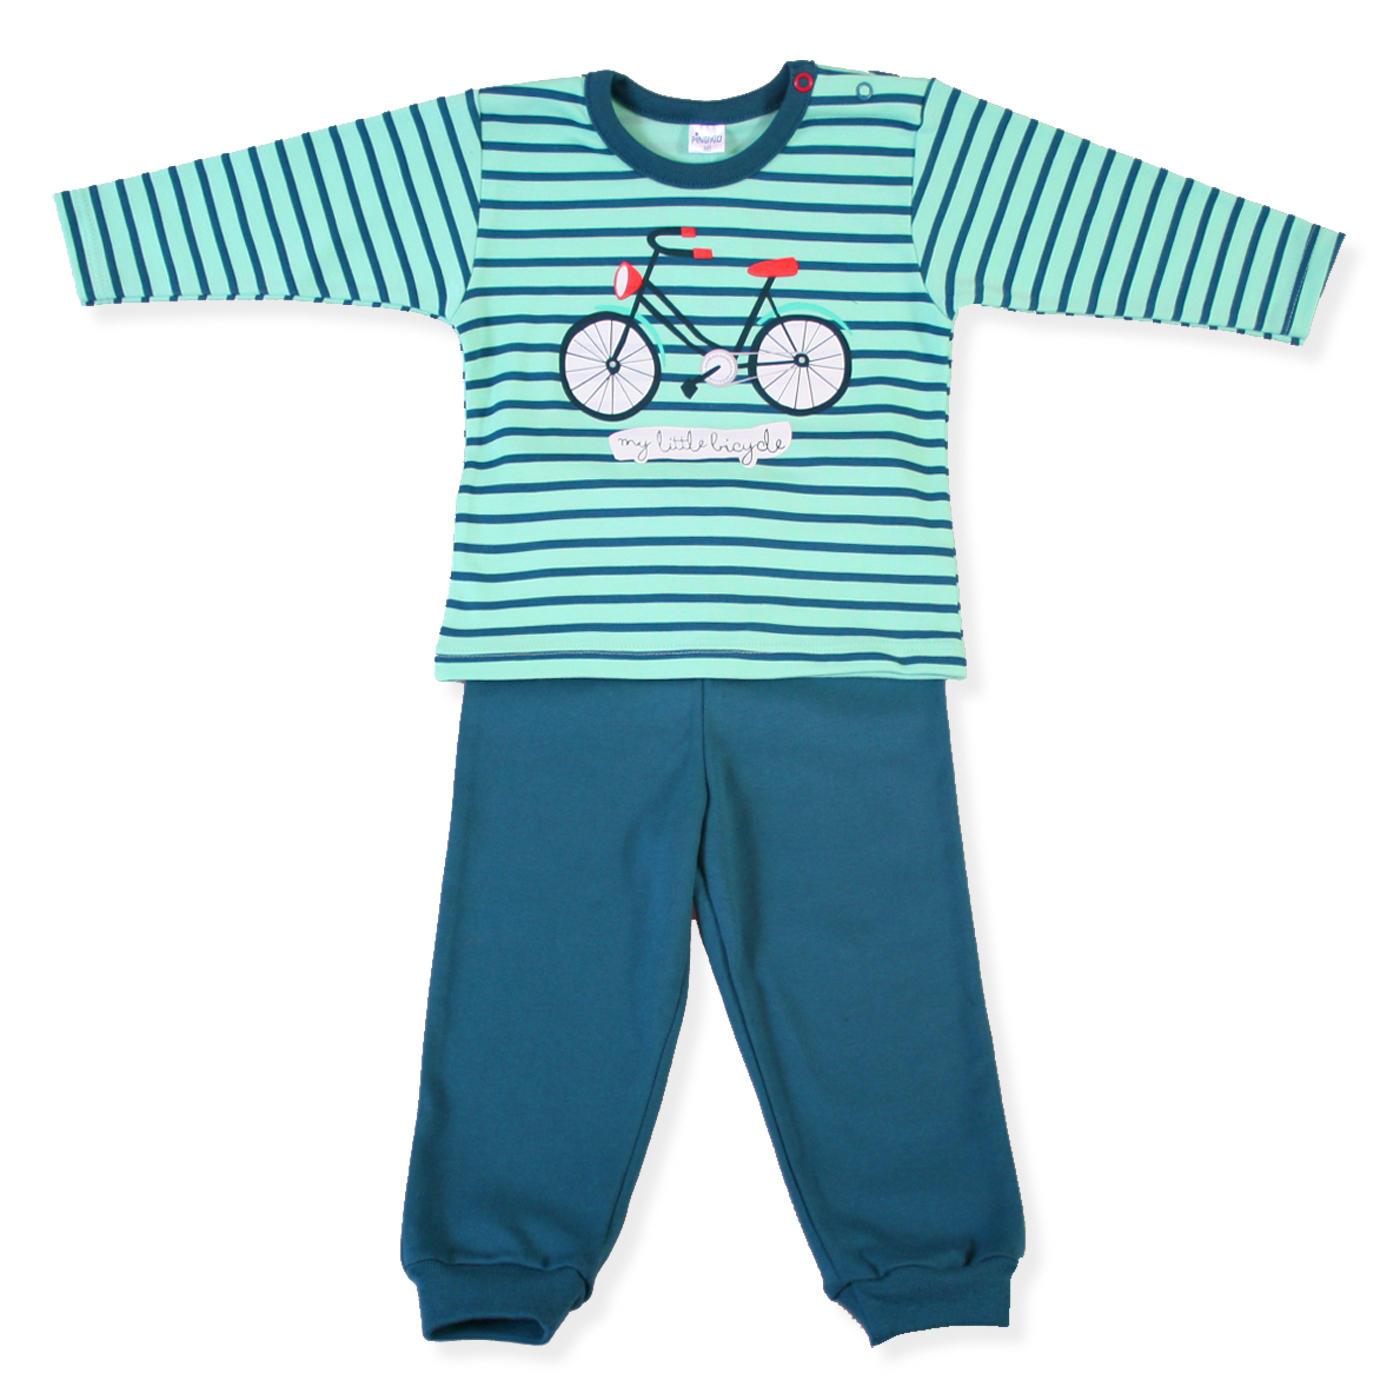 b9d726af6cbb01 Pinokio piżama BIKE w paski rozmiary 80-122 cm